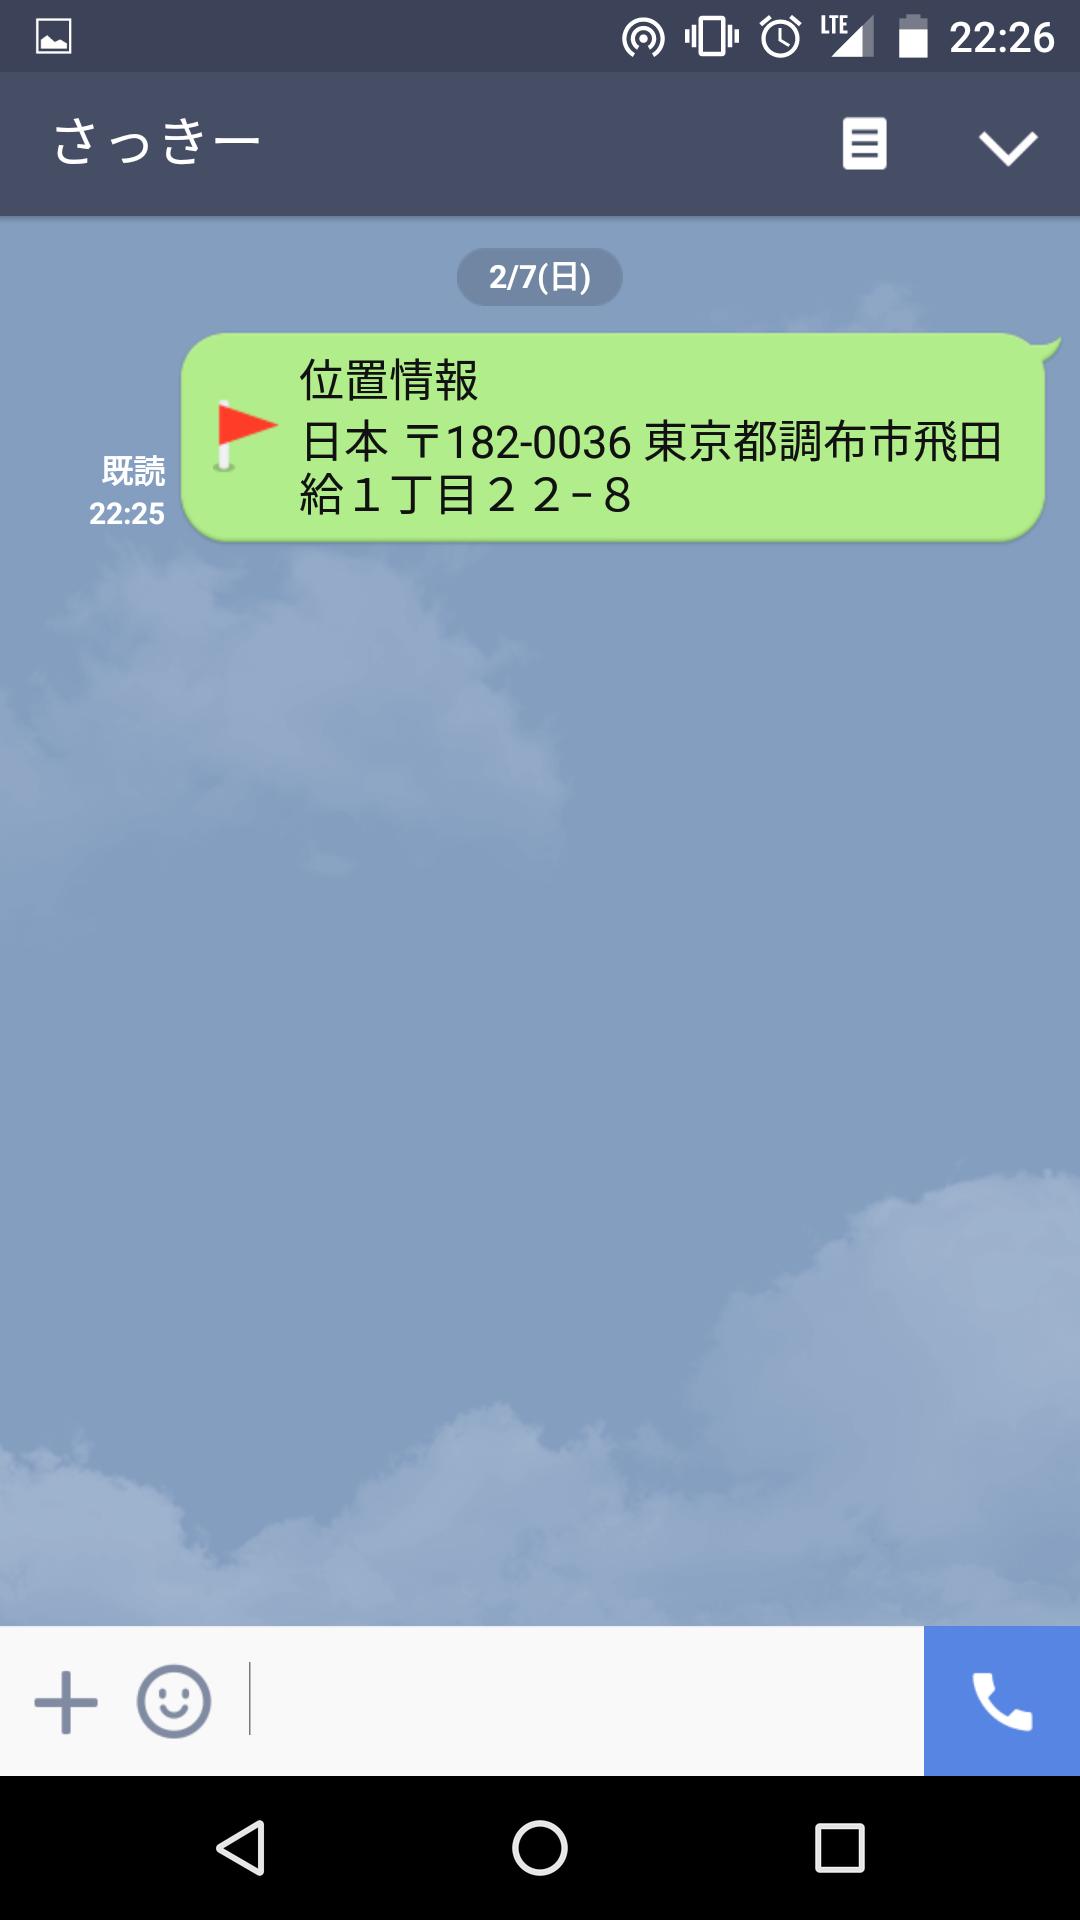 Screenshot_20160207-222606